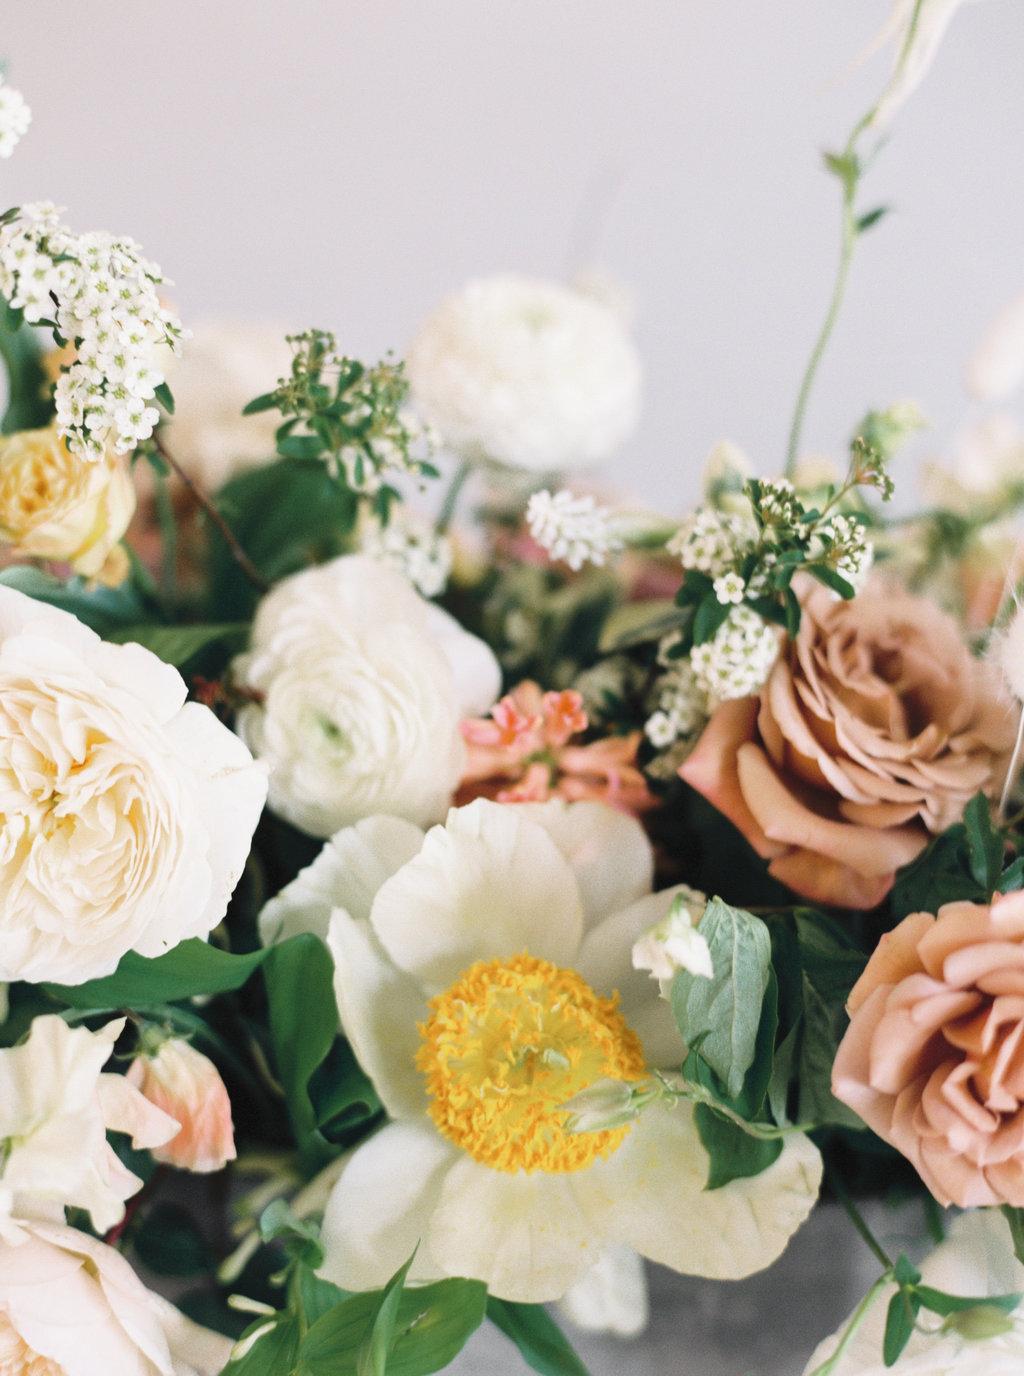 Kelsea_Holder_Photography_Rava_Wines_Bloom_Floral_and_Foliage_9.jpg